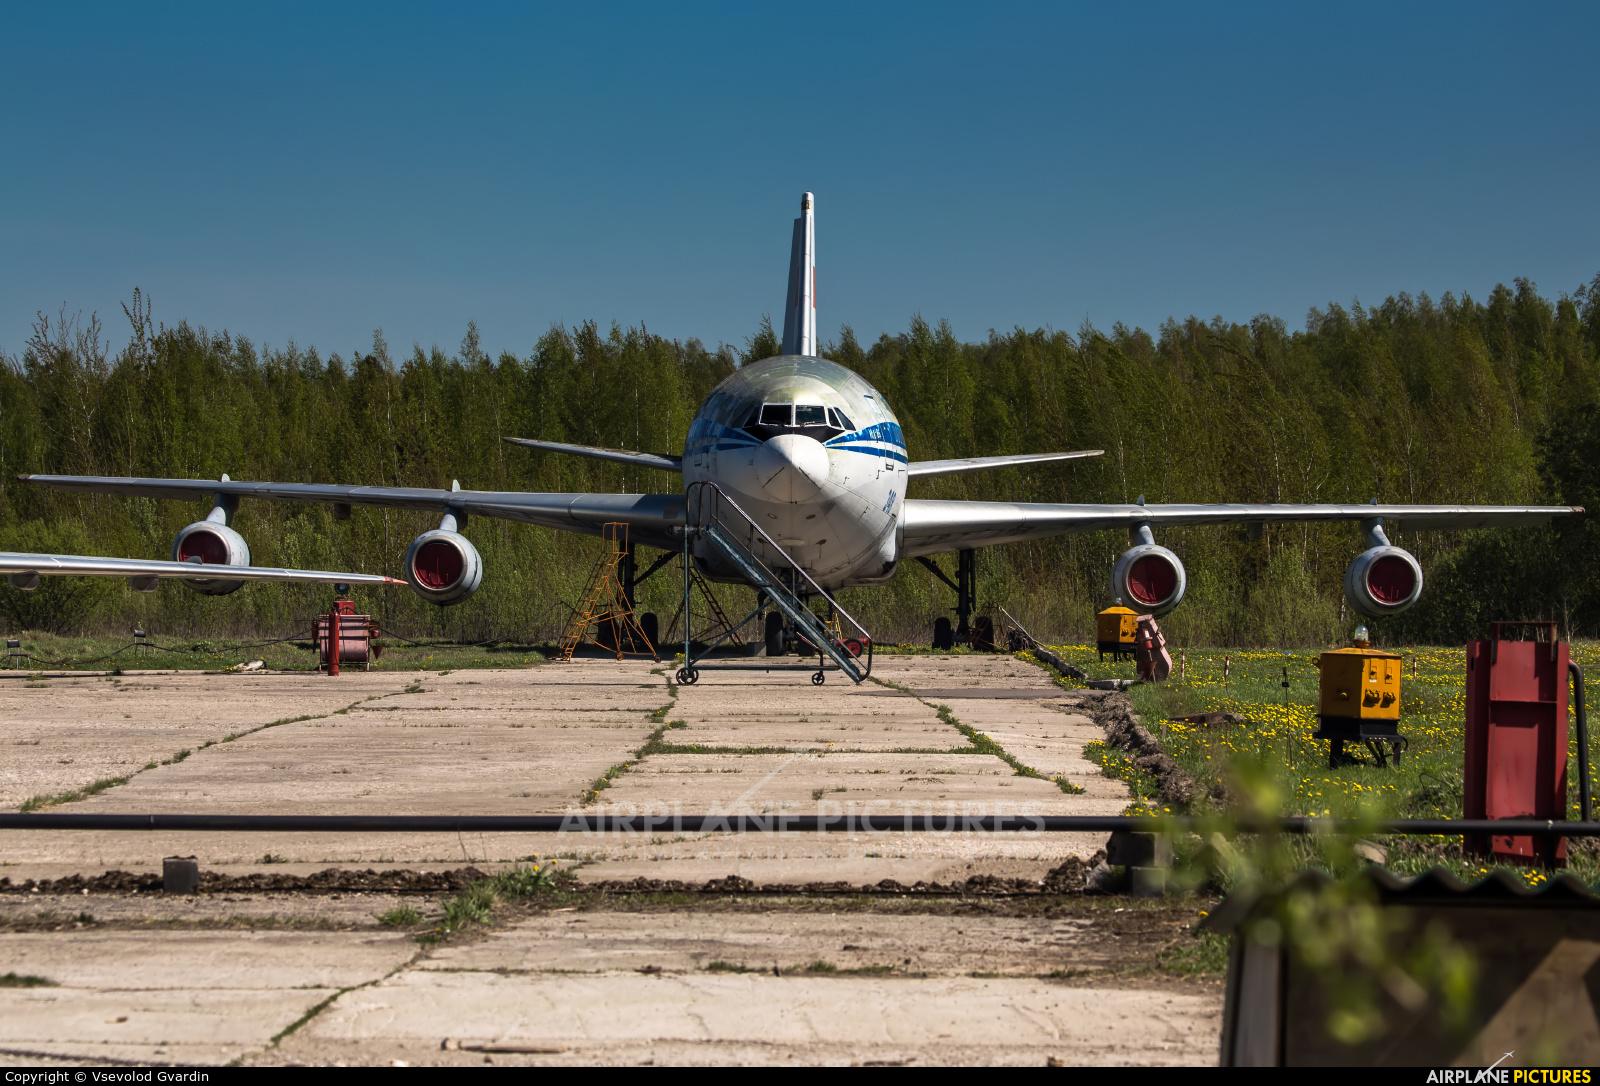 Aeroflot CCCP-86003 aircraft at Moscow - Sheremetyevo